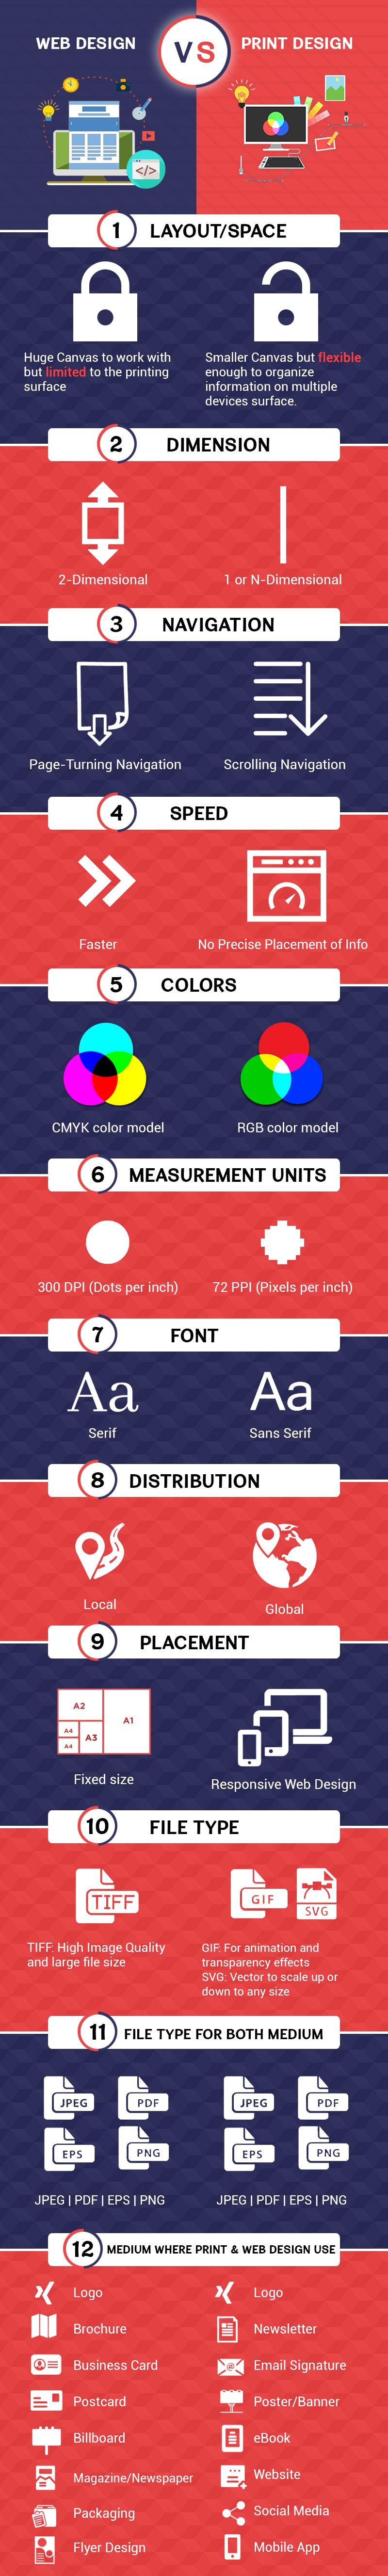 Web Design vs Print Design